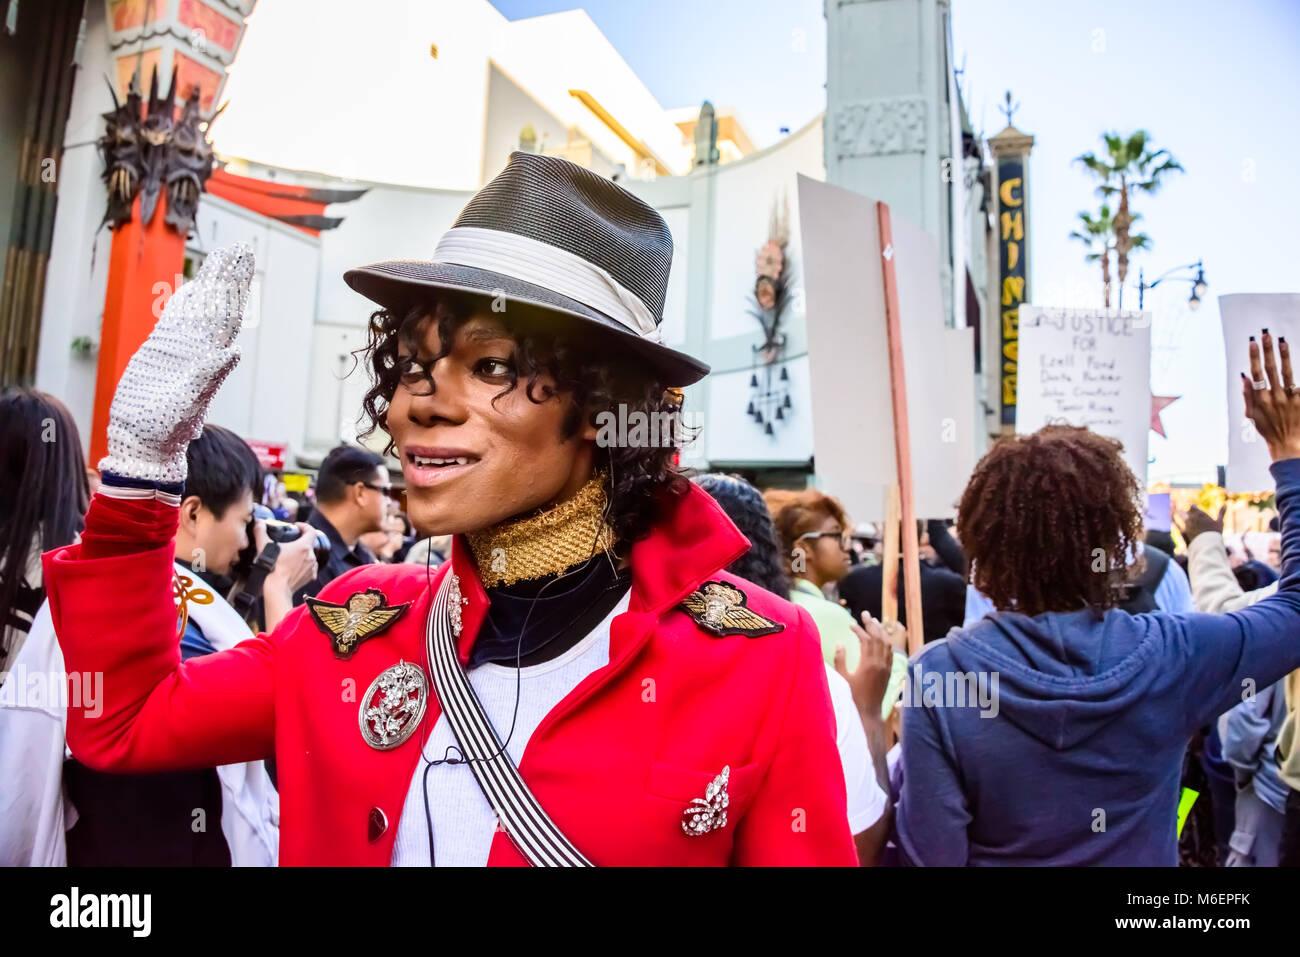 Michael Jackson Impersonator,  Hands up Don't Shoot Black Lives Matter Protest Demonstration, Hollywood Walk - Stock Image